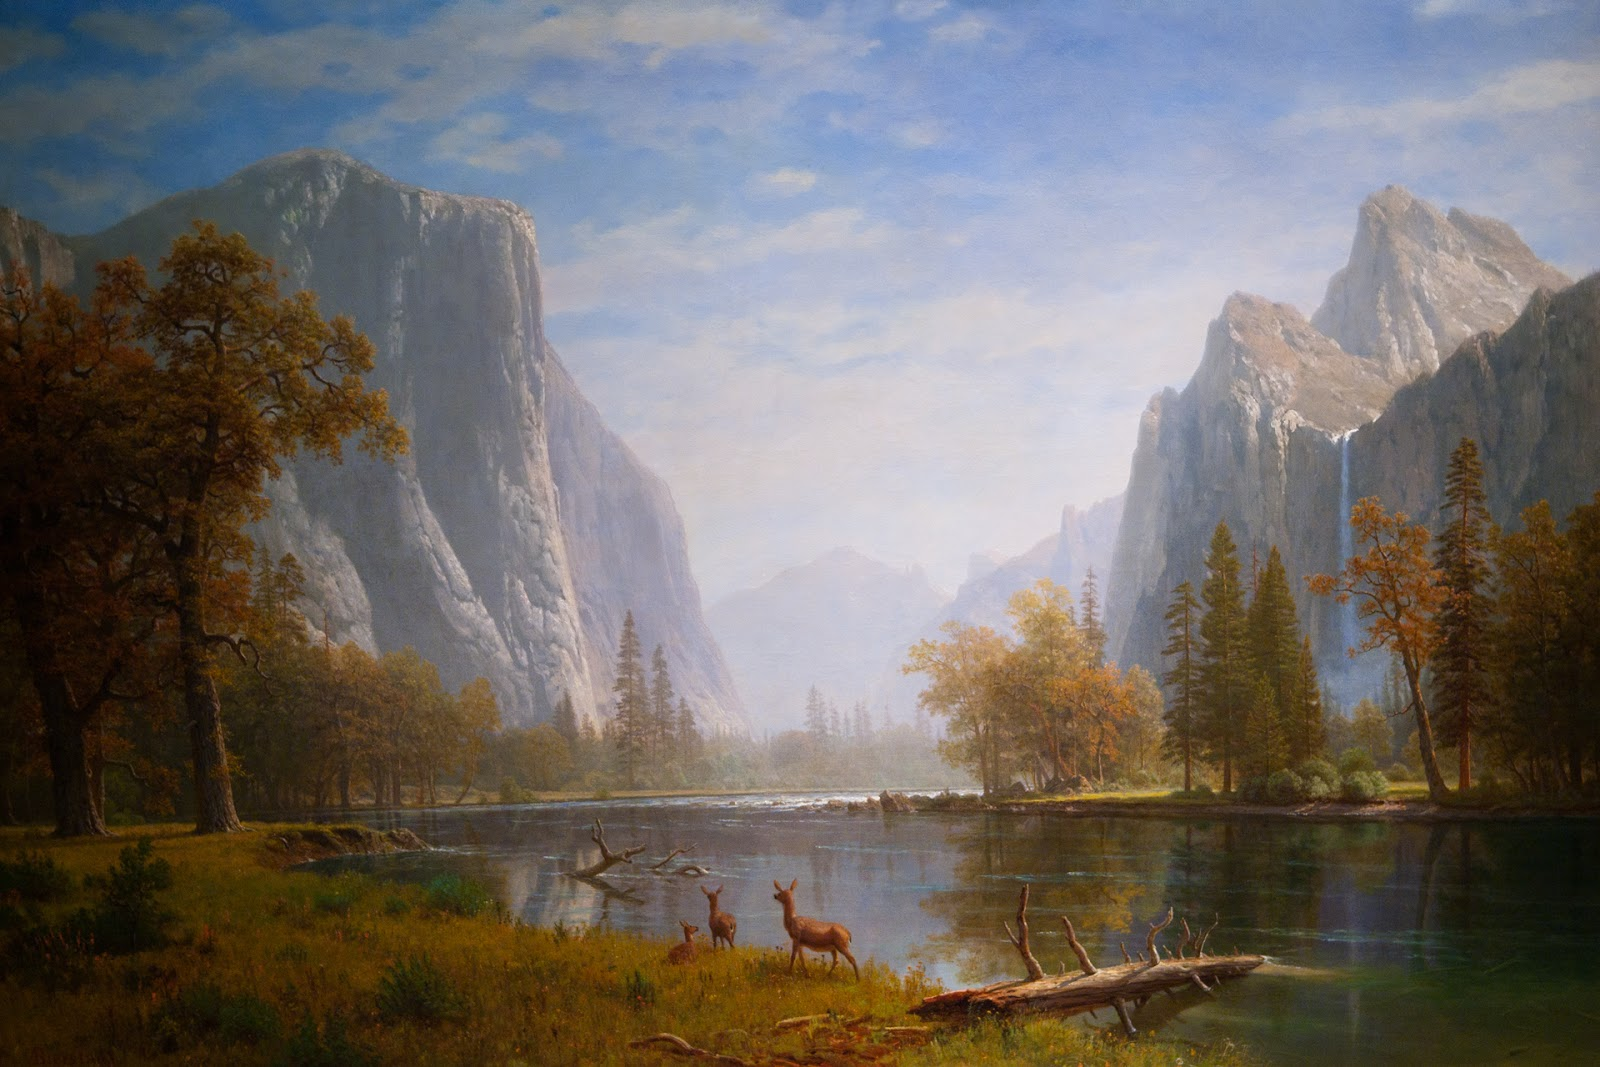 Upper Yosemite Falls Wallpaper 19th Century American Paintings Albert Bierstadt Ctd